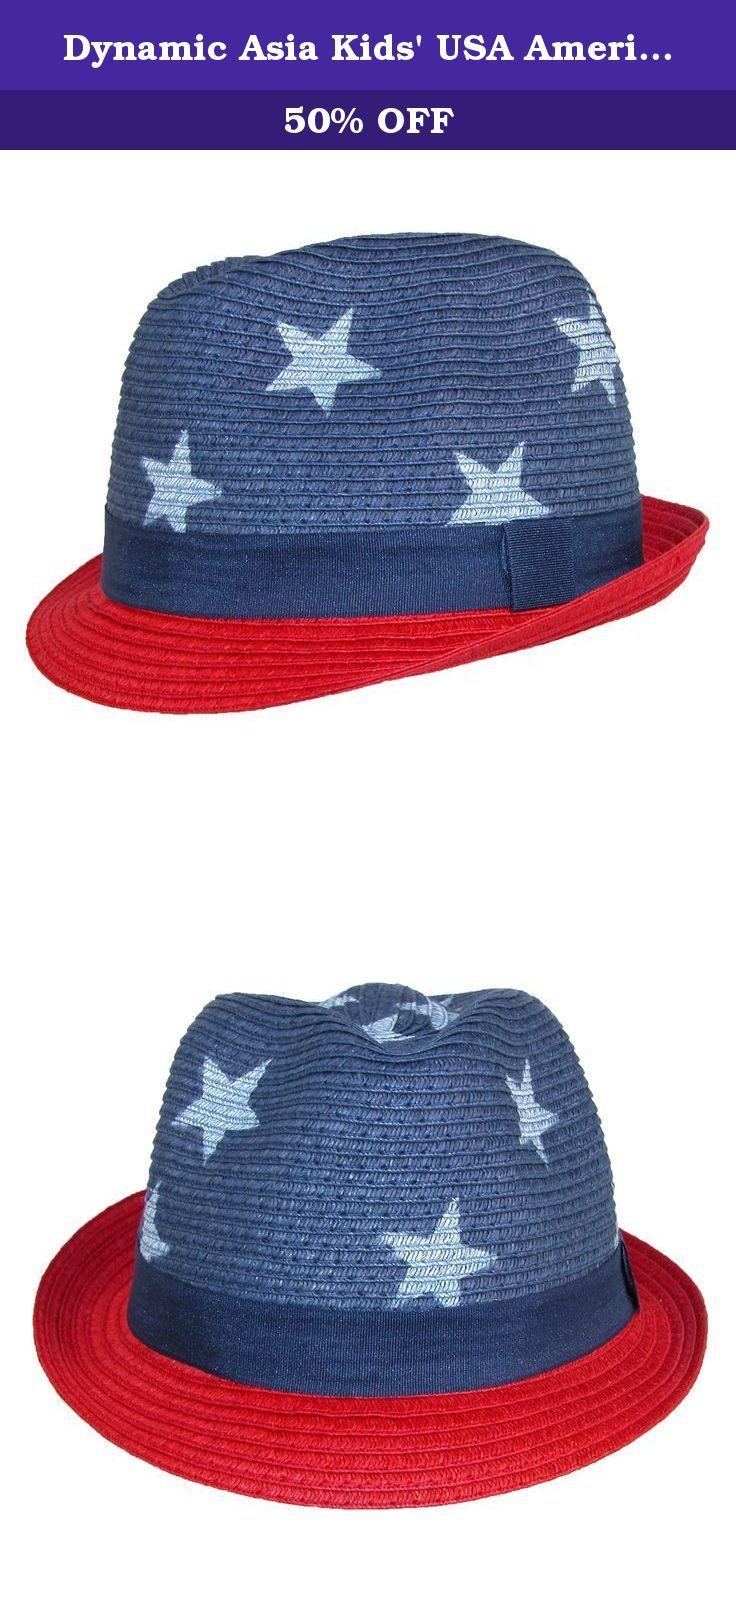 7cd4965c6fb Dynamic Asia Kids  USA American Flag Fedora Hat